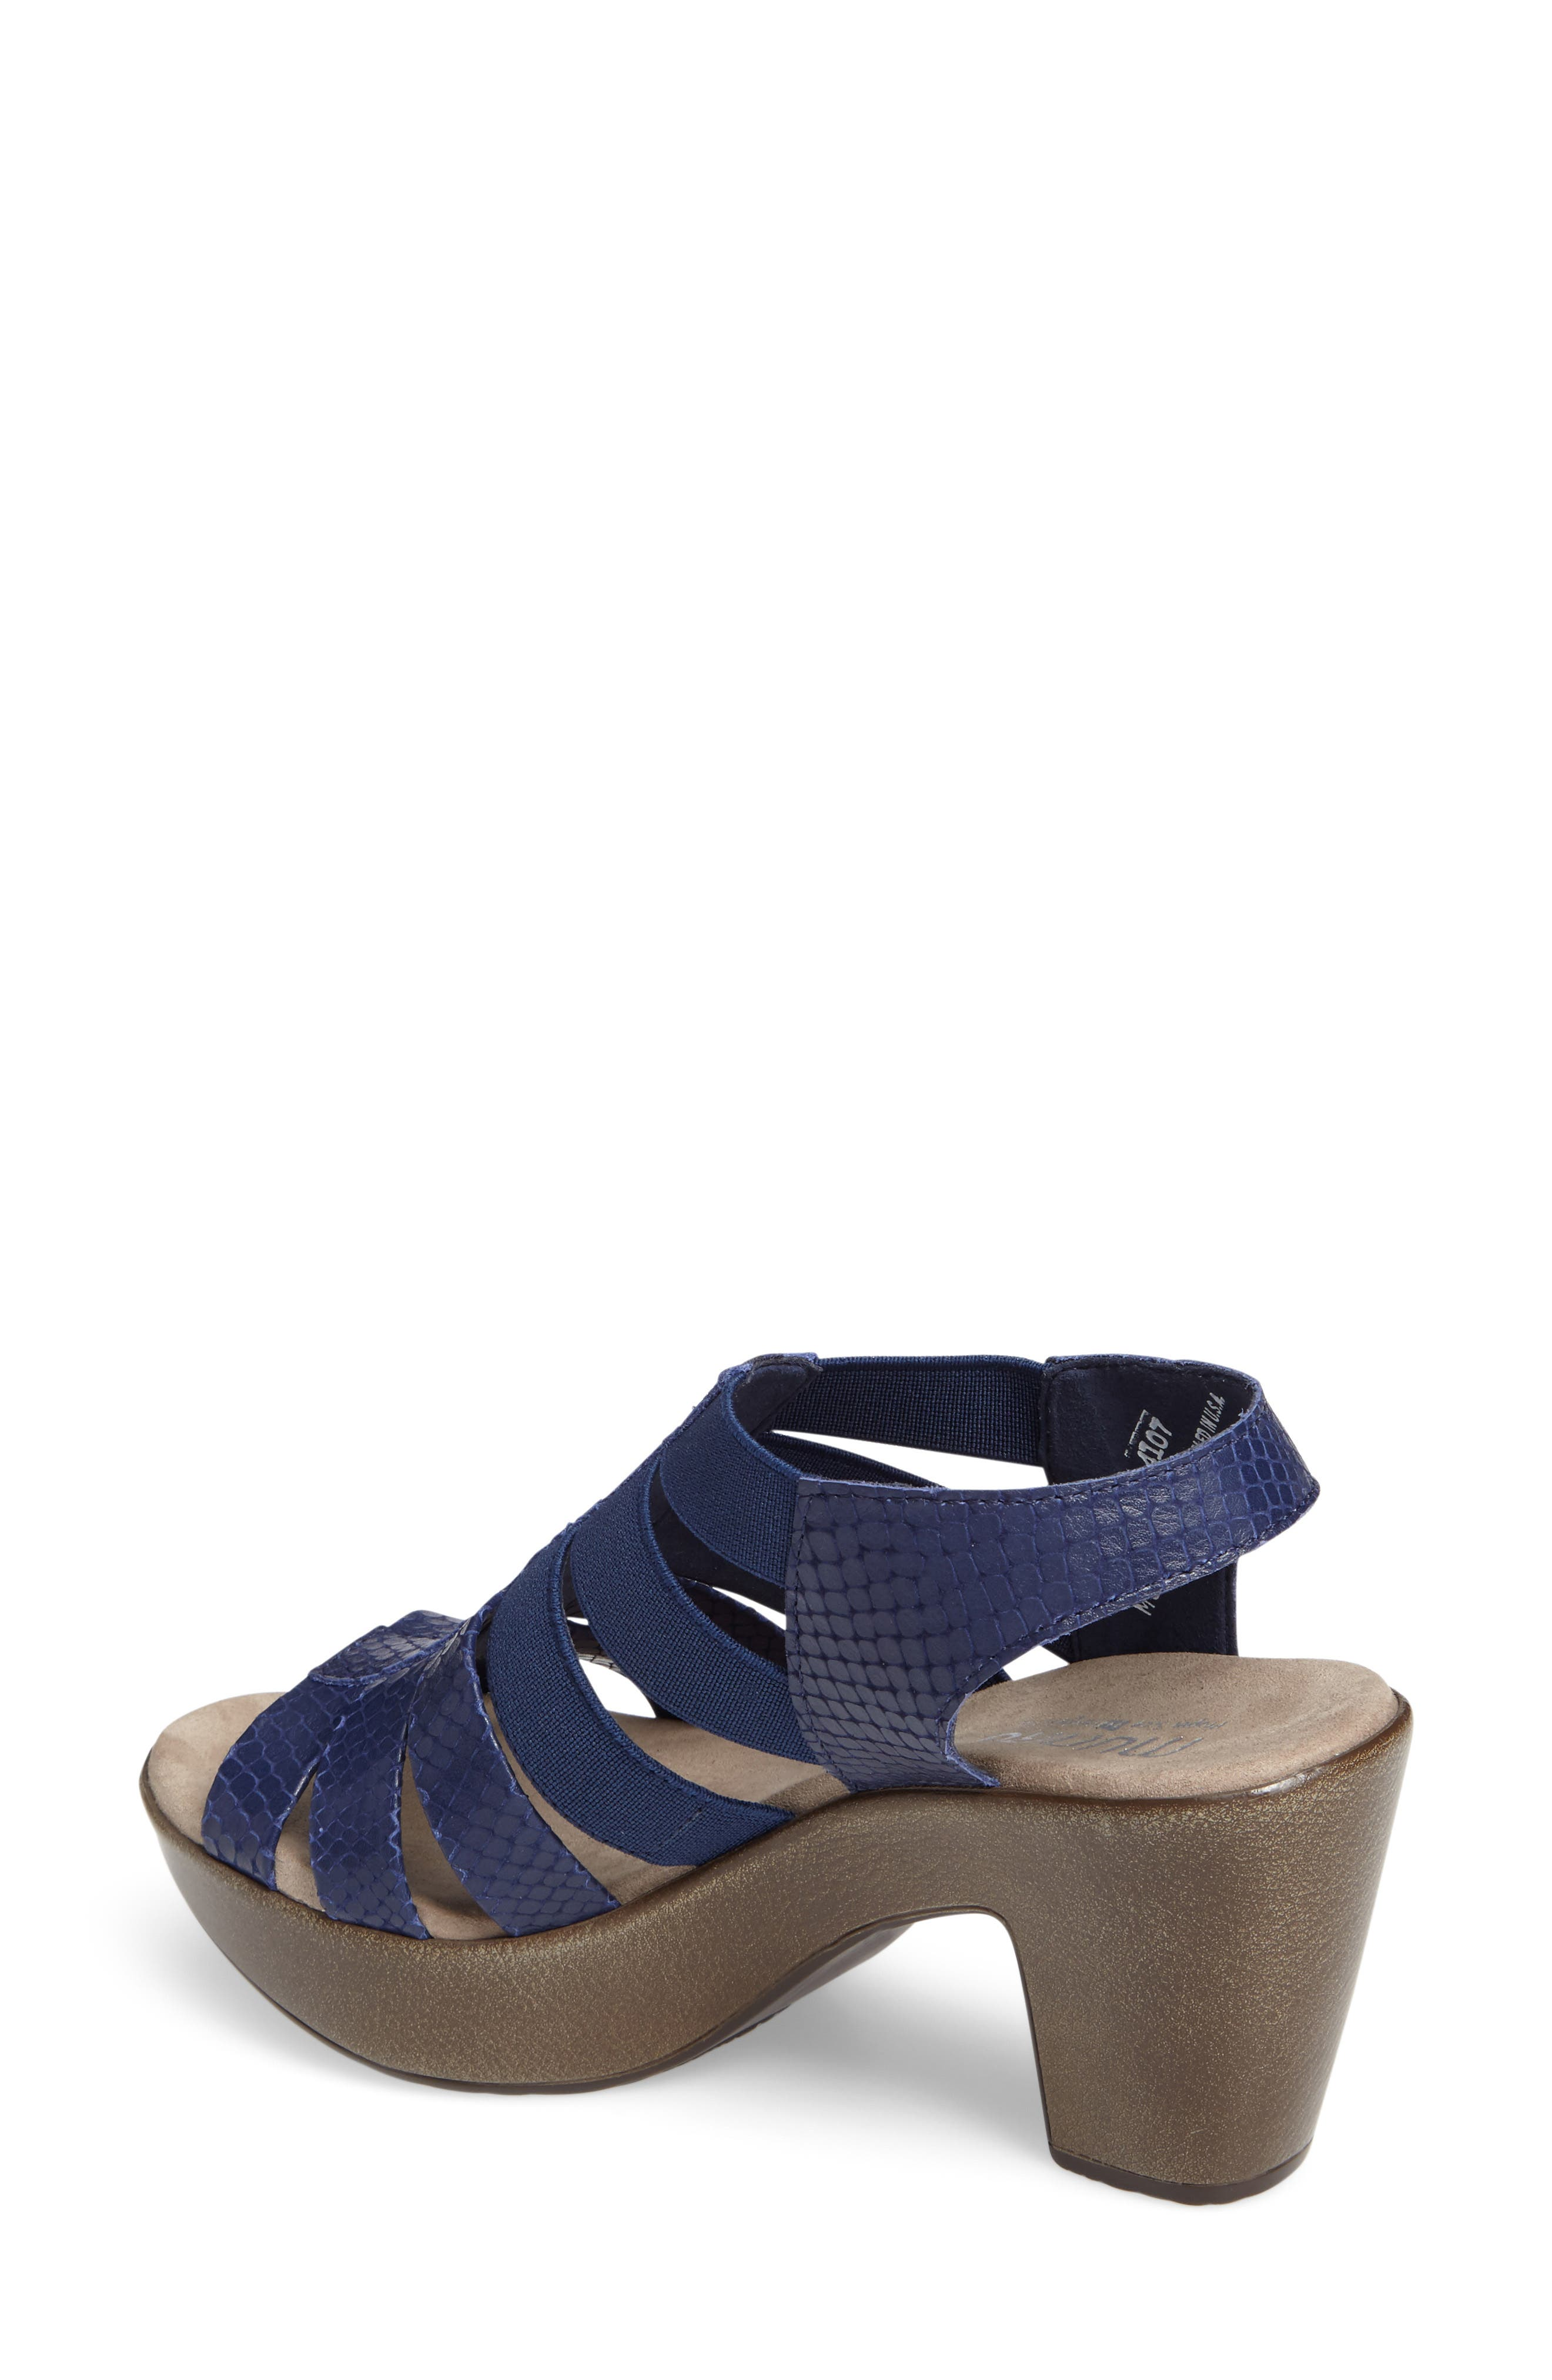 Alternate Image 2  - Munro 'Cookie' Slingback Sandal (Women)